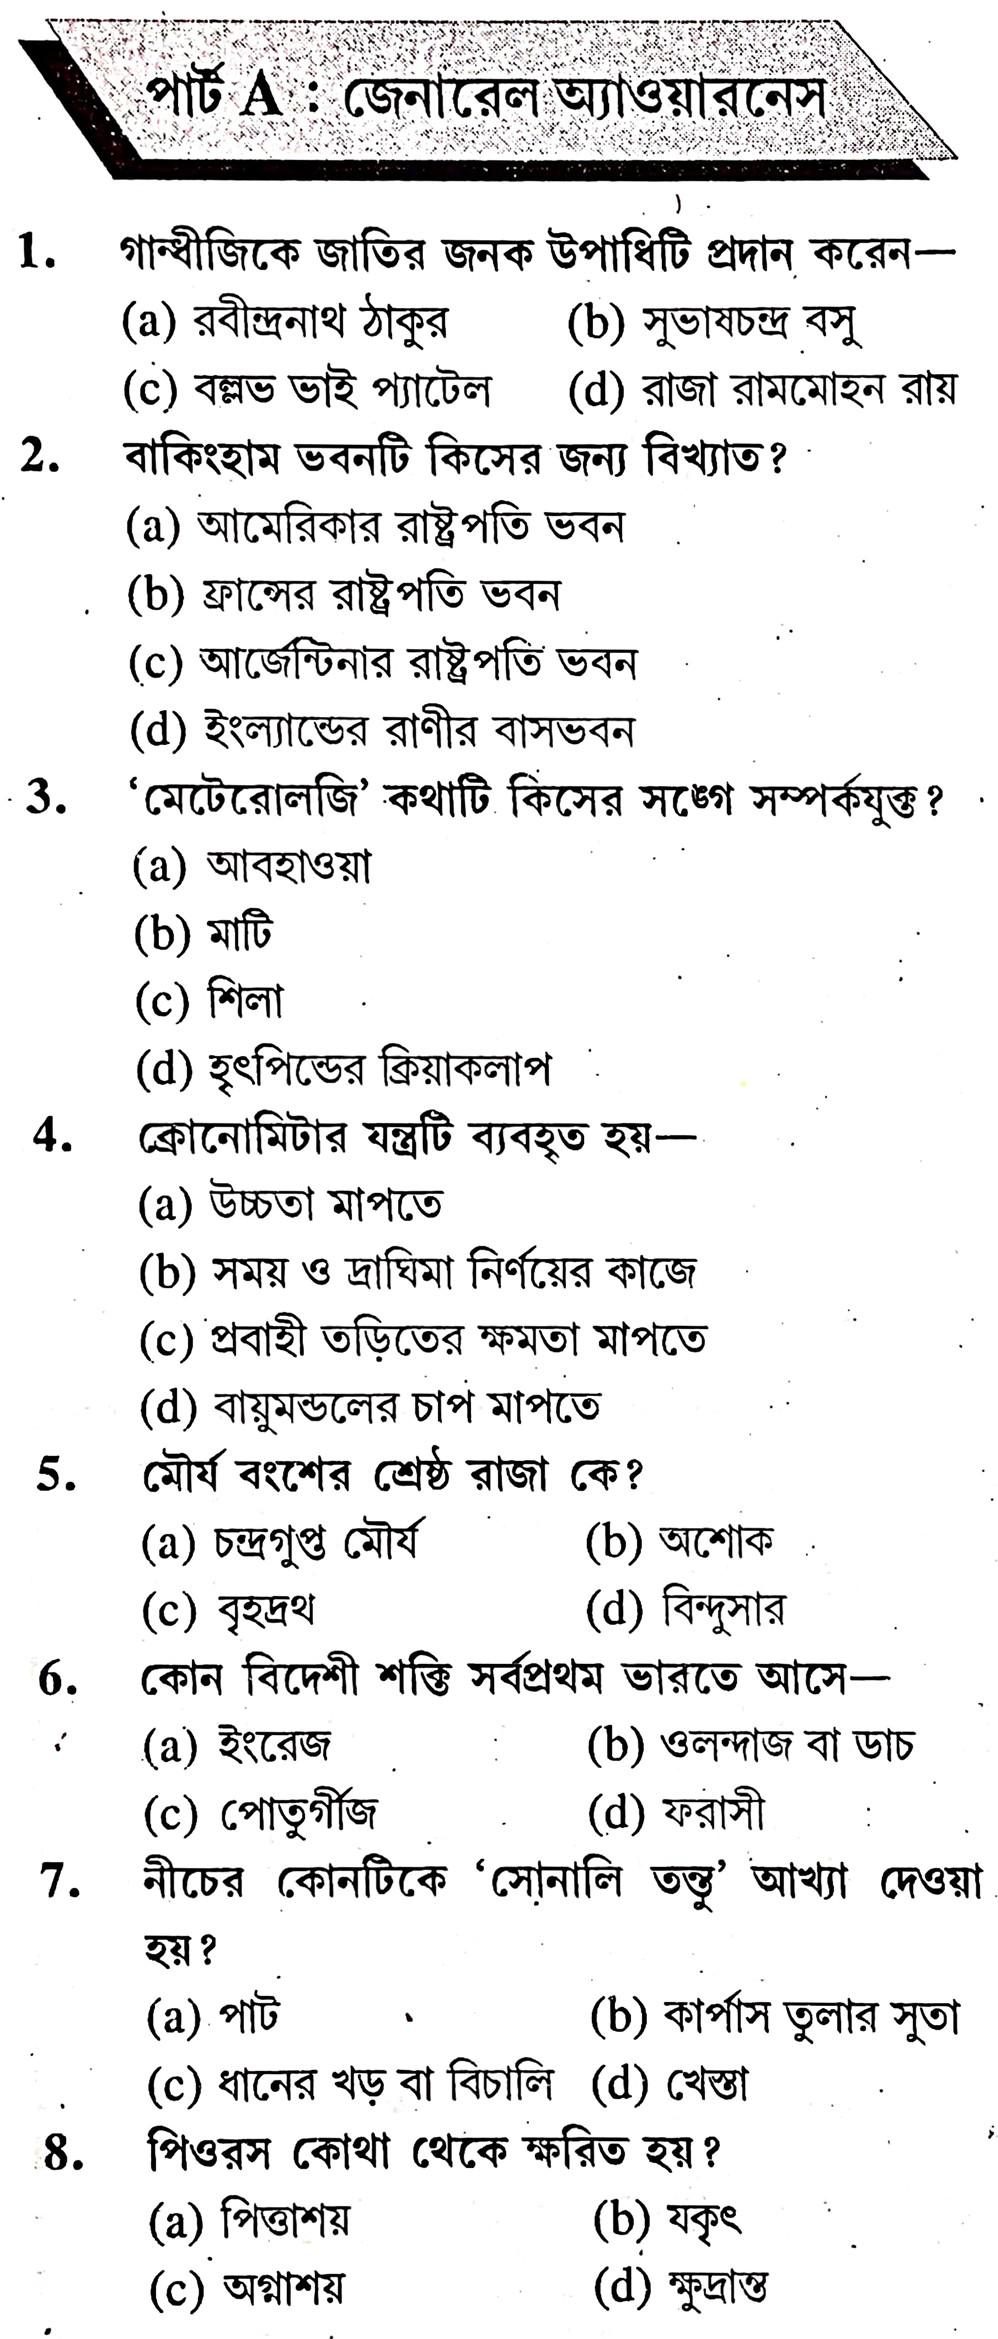 West Bengal Police Constable Preliminary Practice Set - 19 In Bengali    পশ্চিমবঙ্গ পুলিশ কনস্টেবল প্রিলিমিনারী প্র্যাকটিস সেট -১৯ - WBCS Notebook